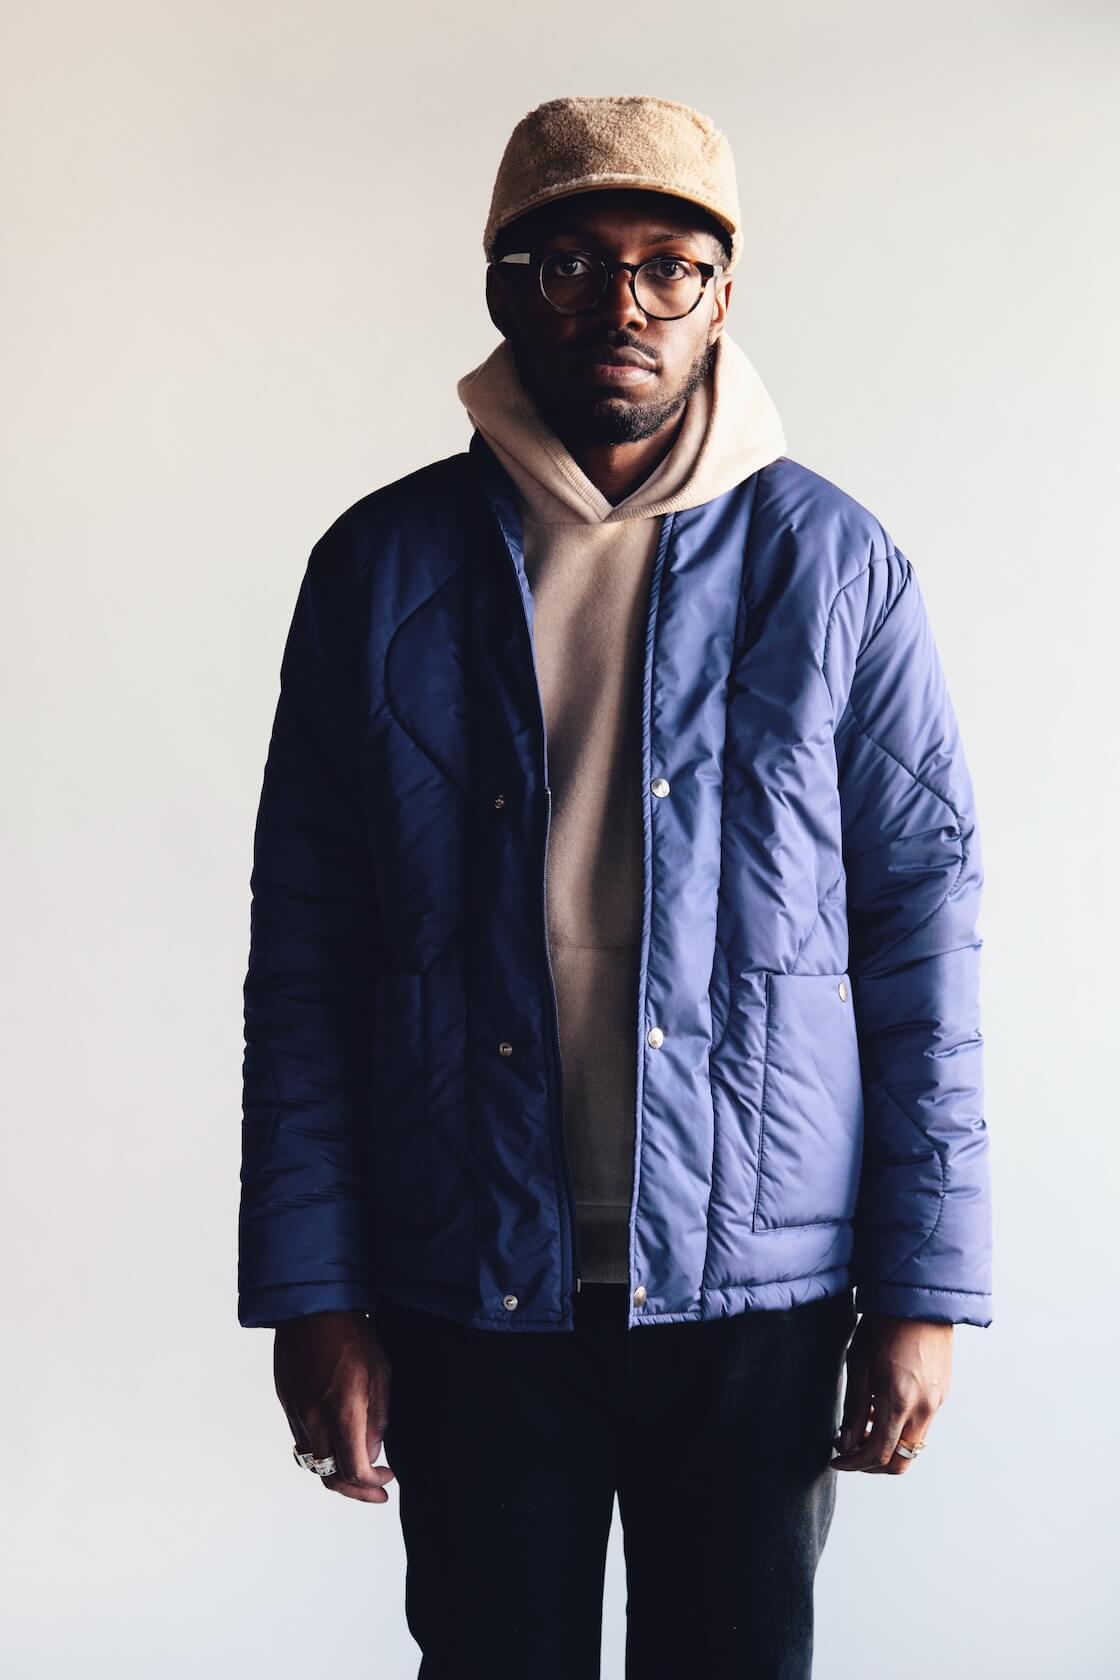 cableami boa fleece cap, la paz barbosa padded jacket, la paz matias hoodie, harmony dorian jean on body